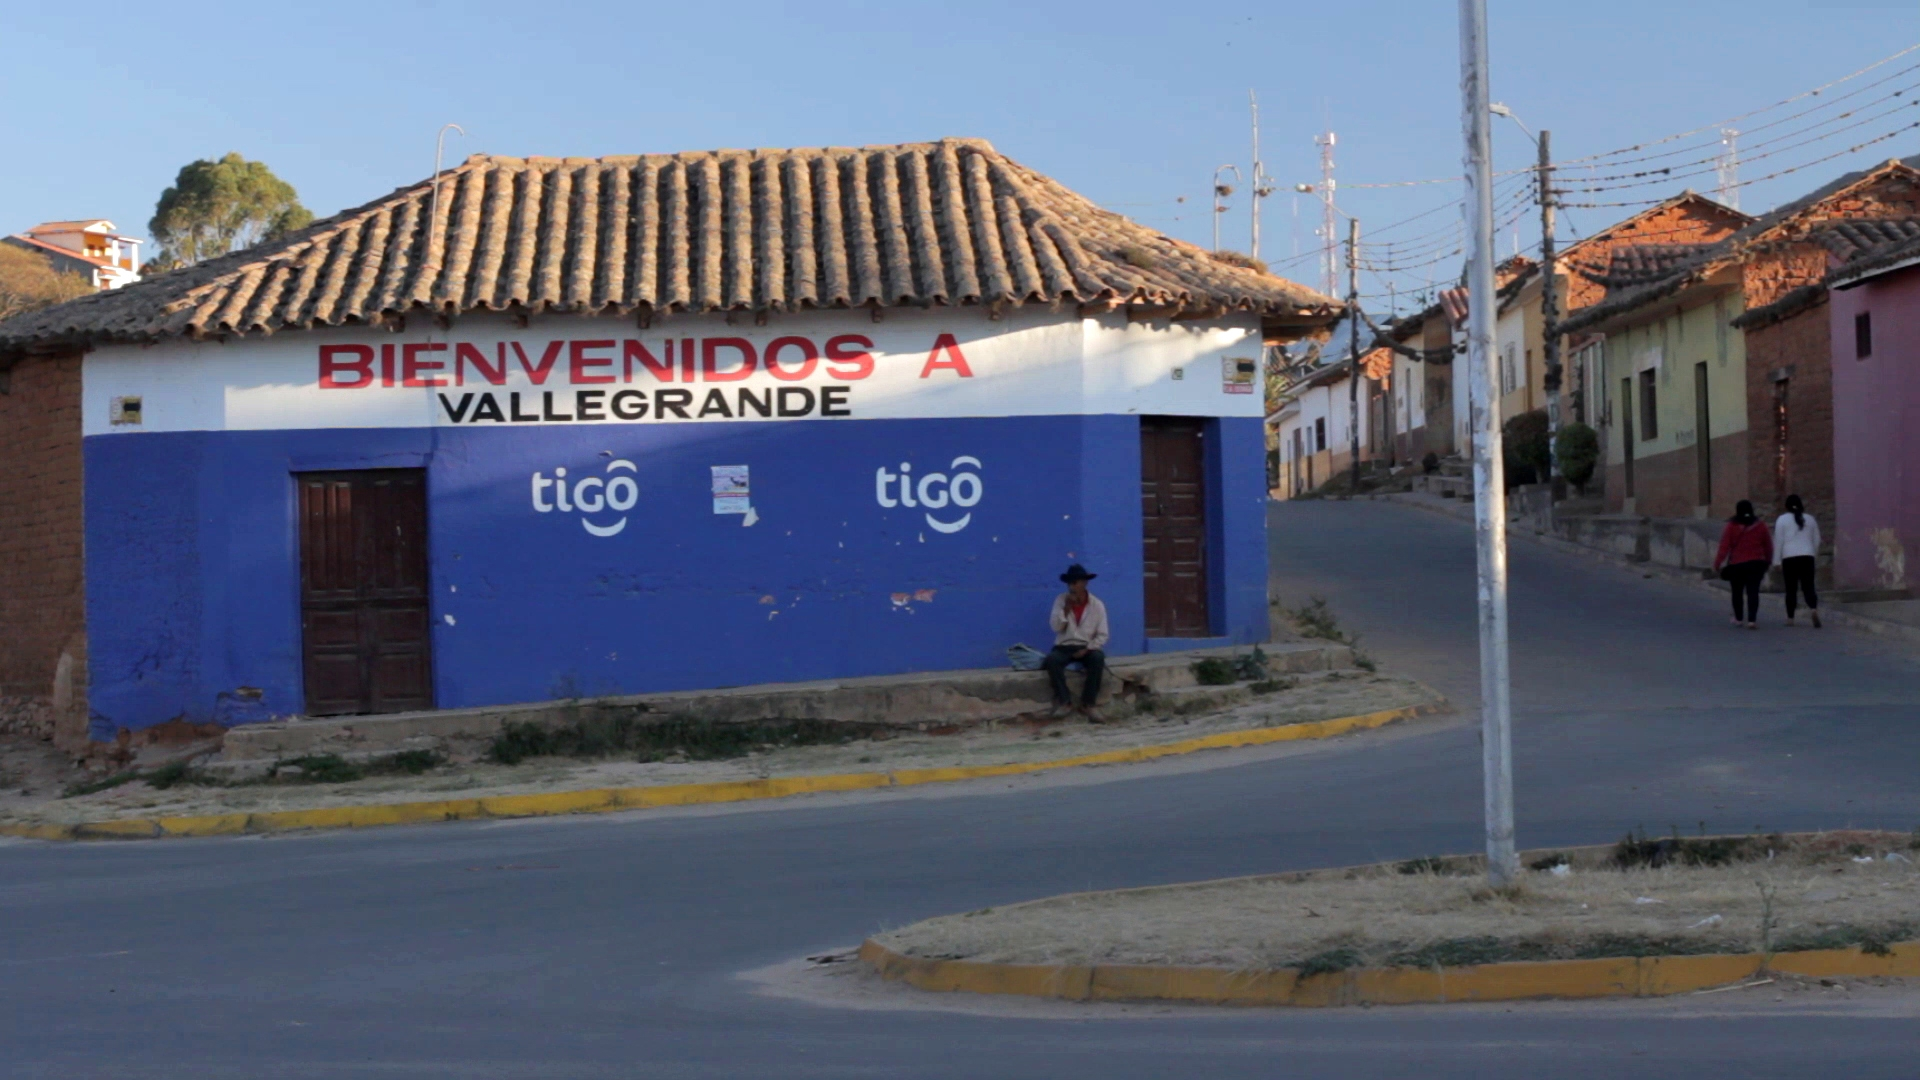 vallegrande pablocaminante benvenidos - Ruta del Che 1/2, Vallegrande